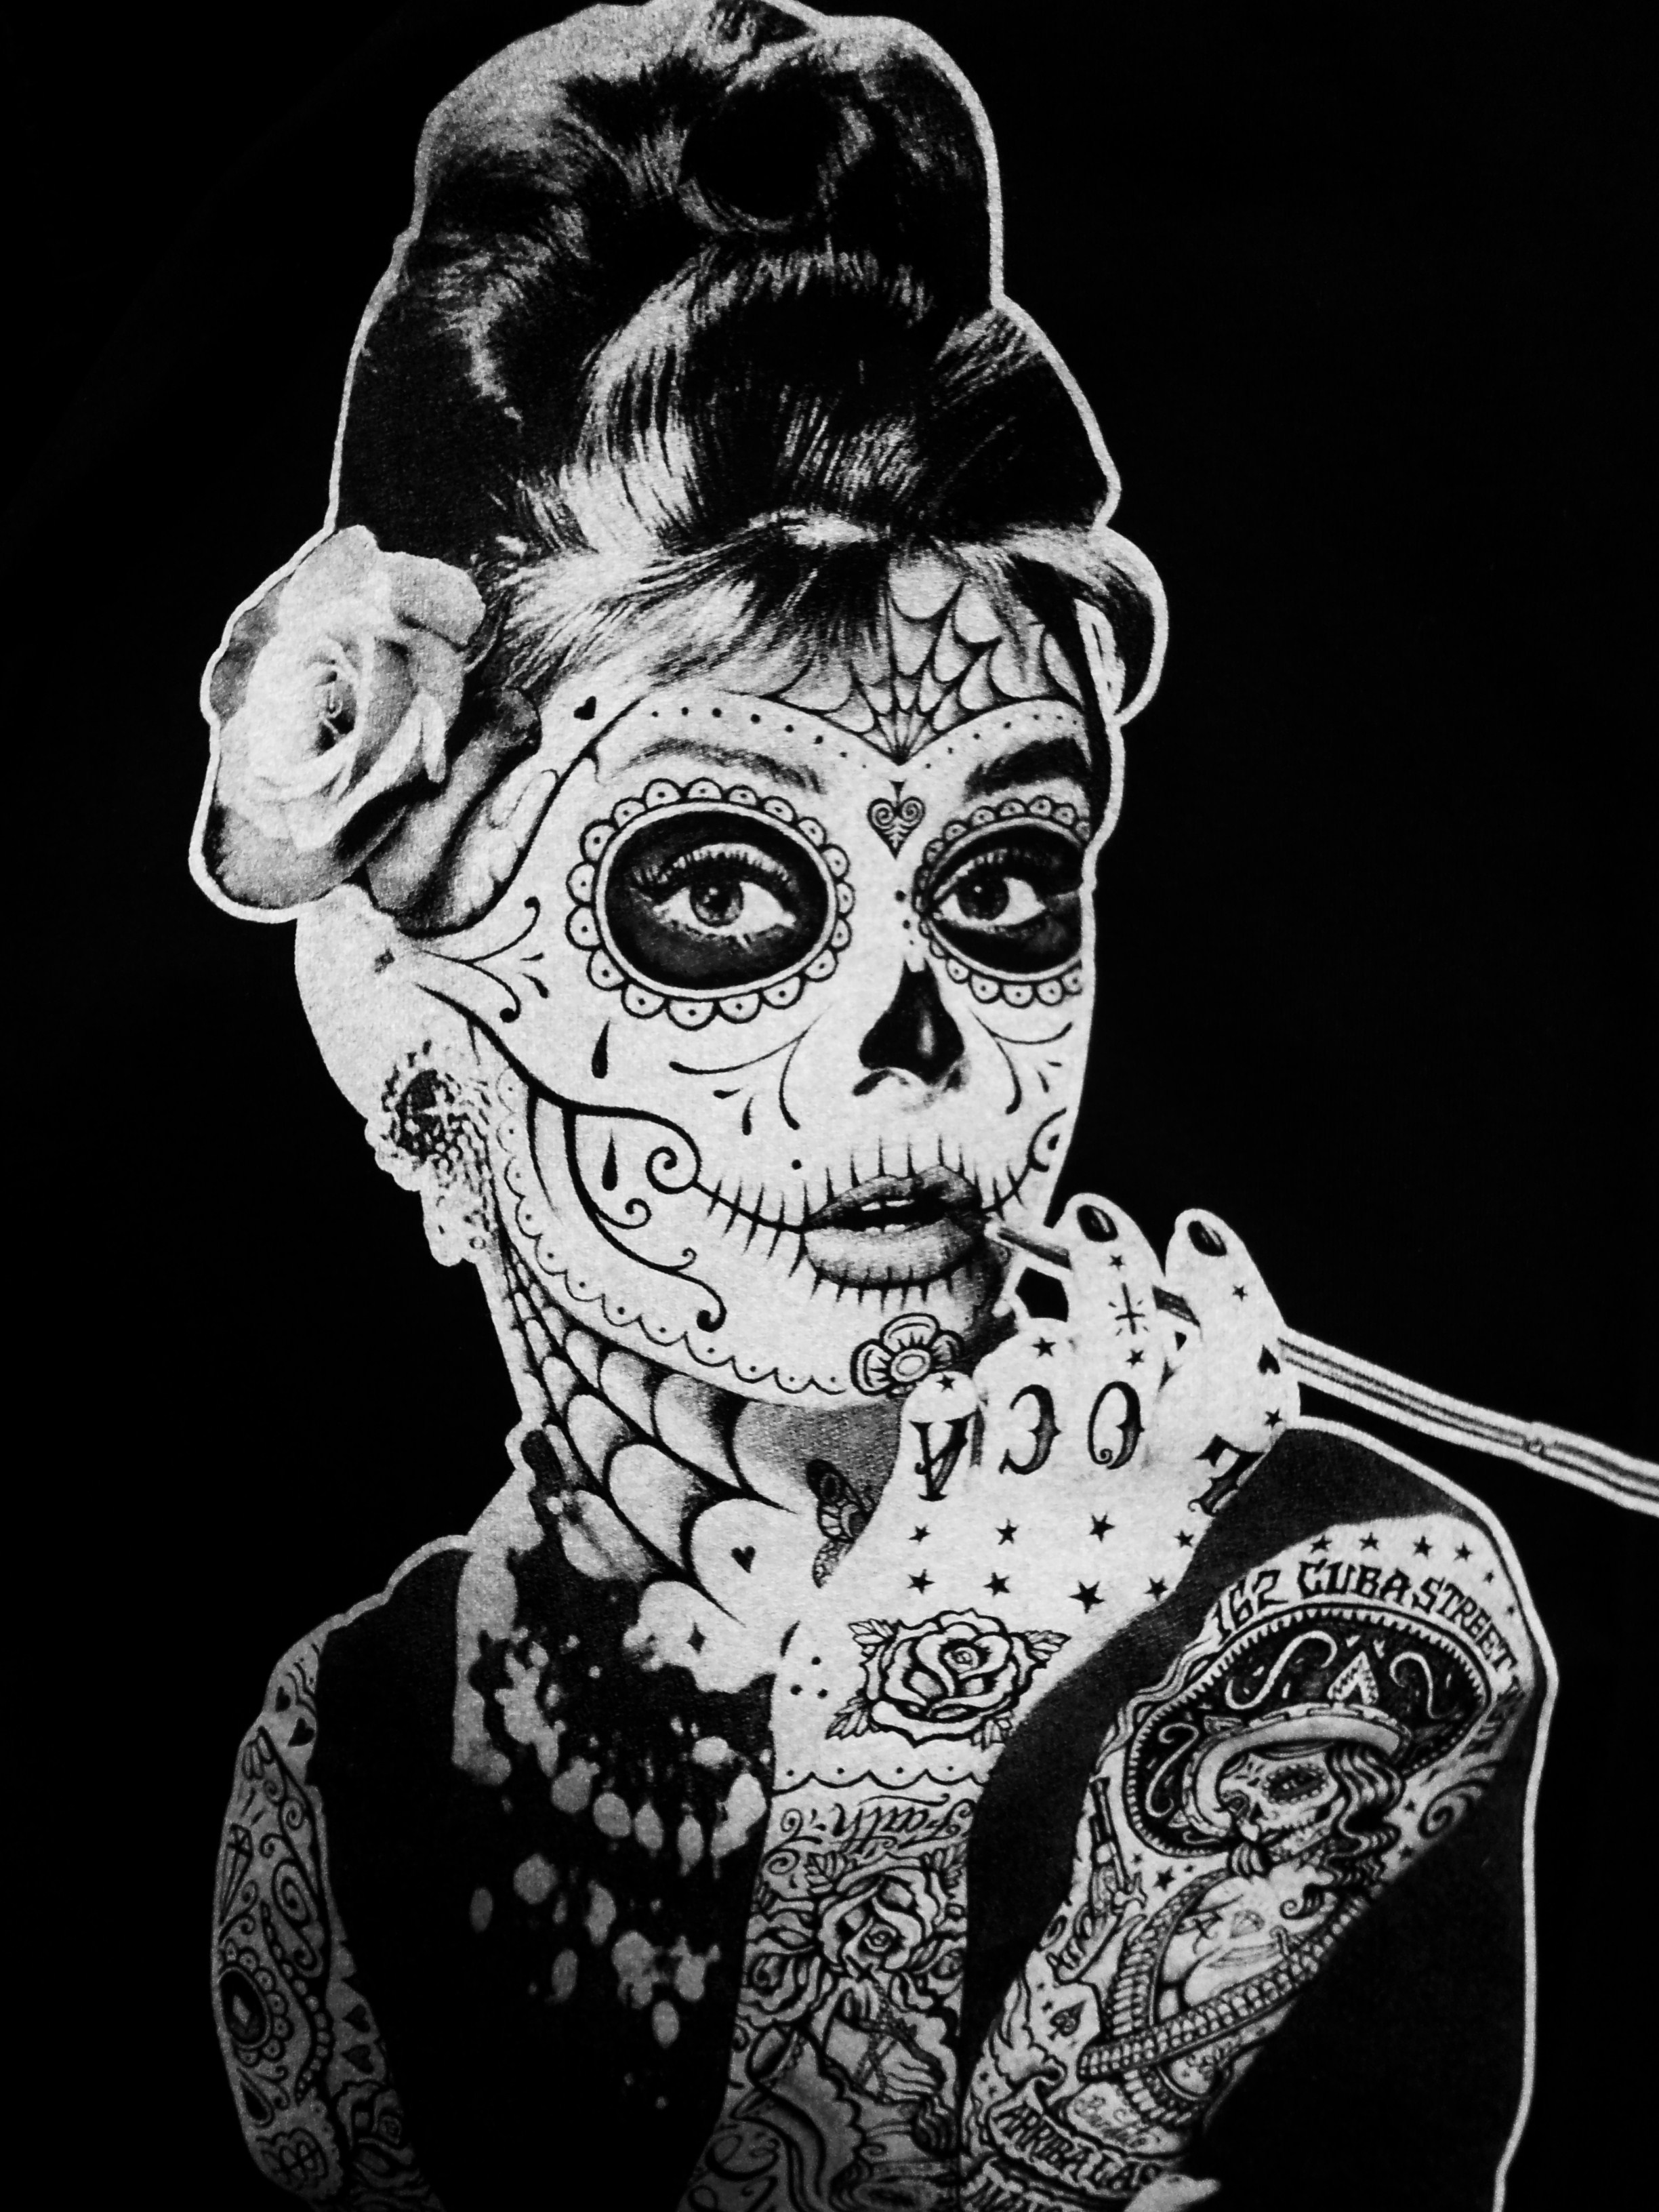 Drawn sugar skull audrey hepburn At i as Hepburn ever